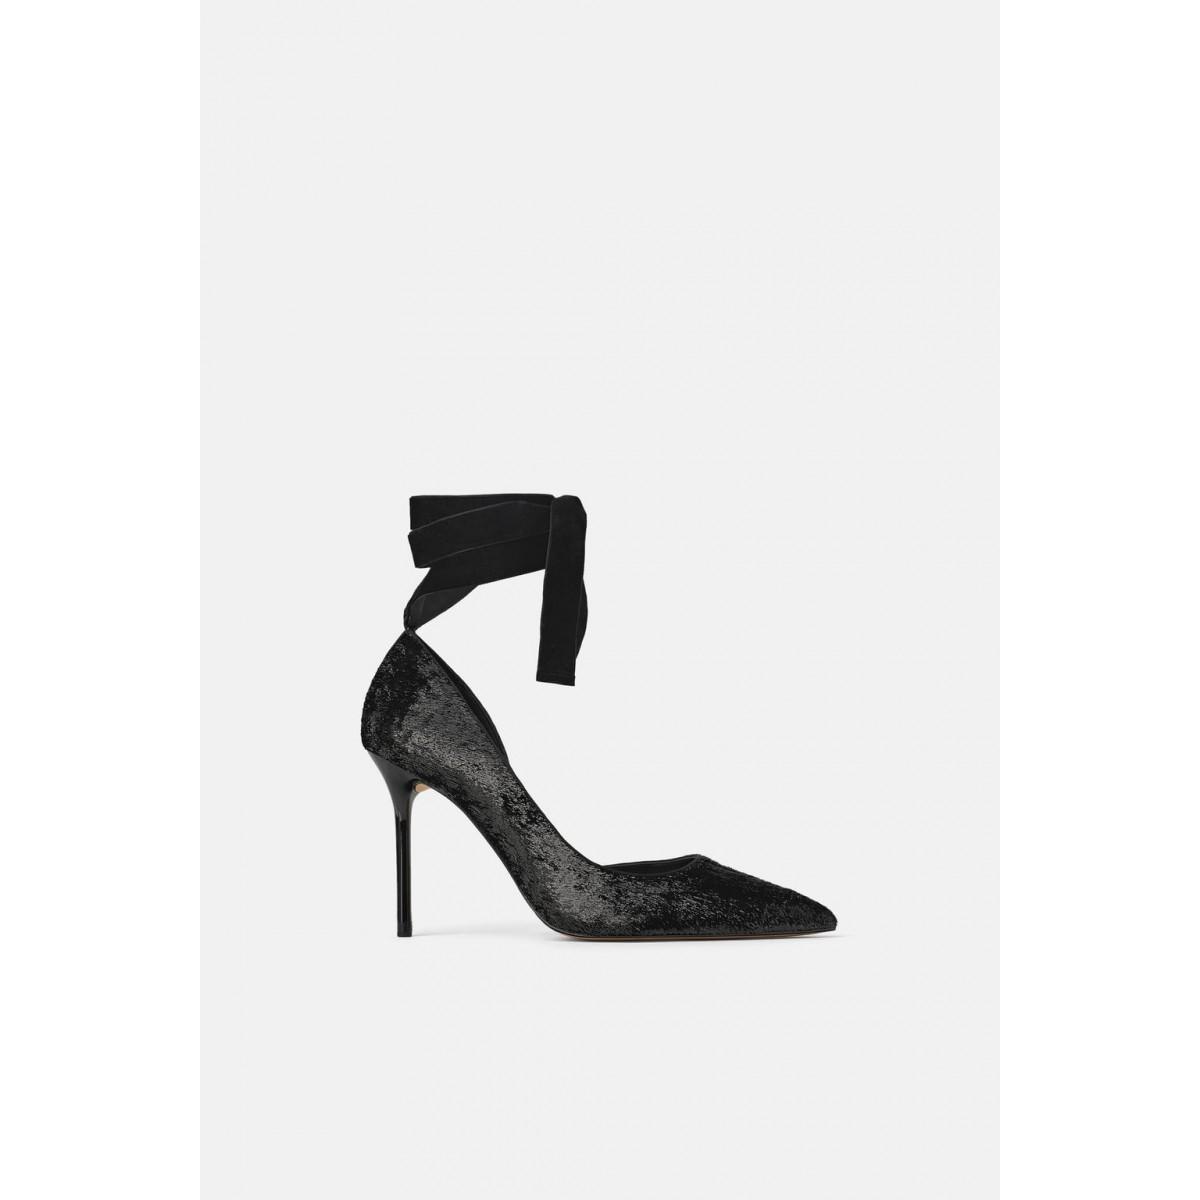 Zara Shimmer Effect High Heel Shoes